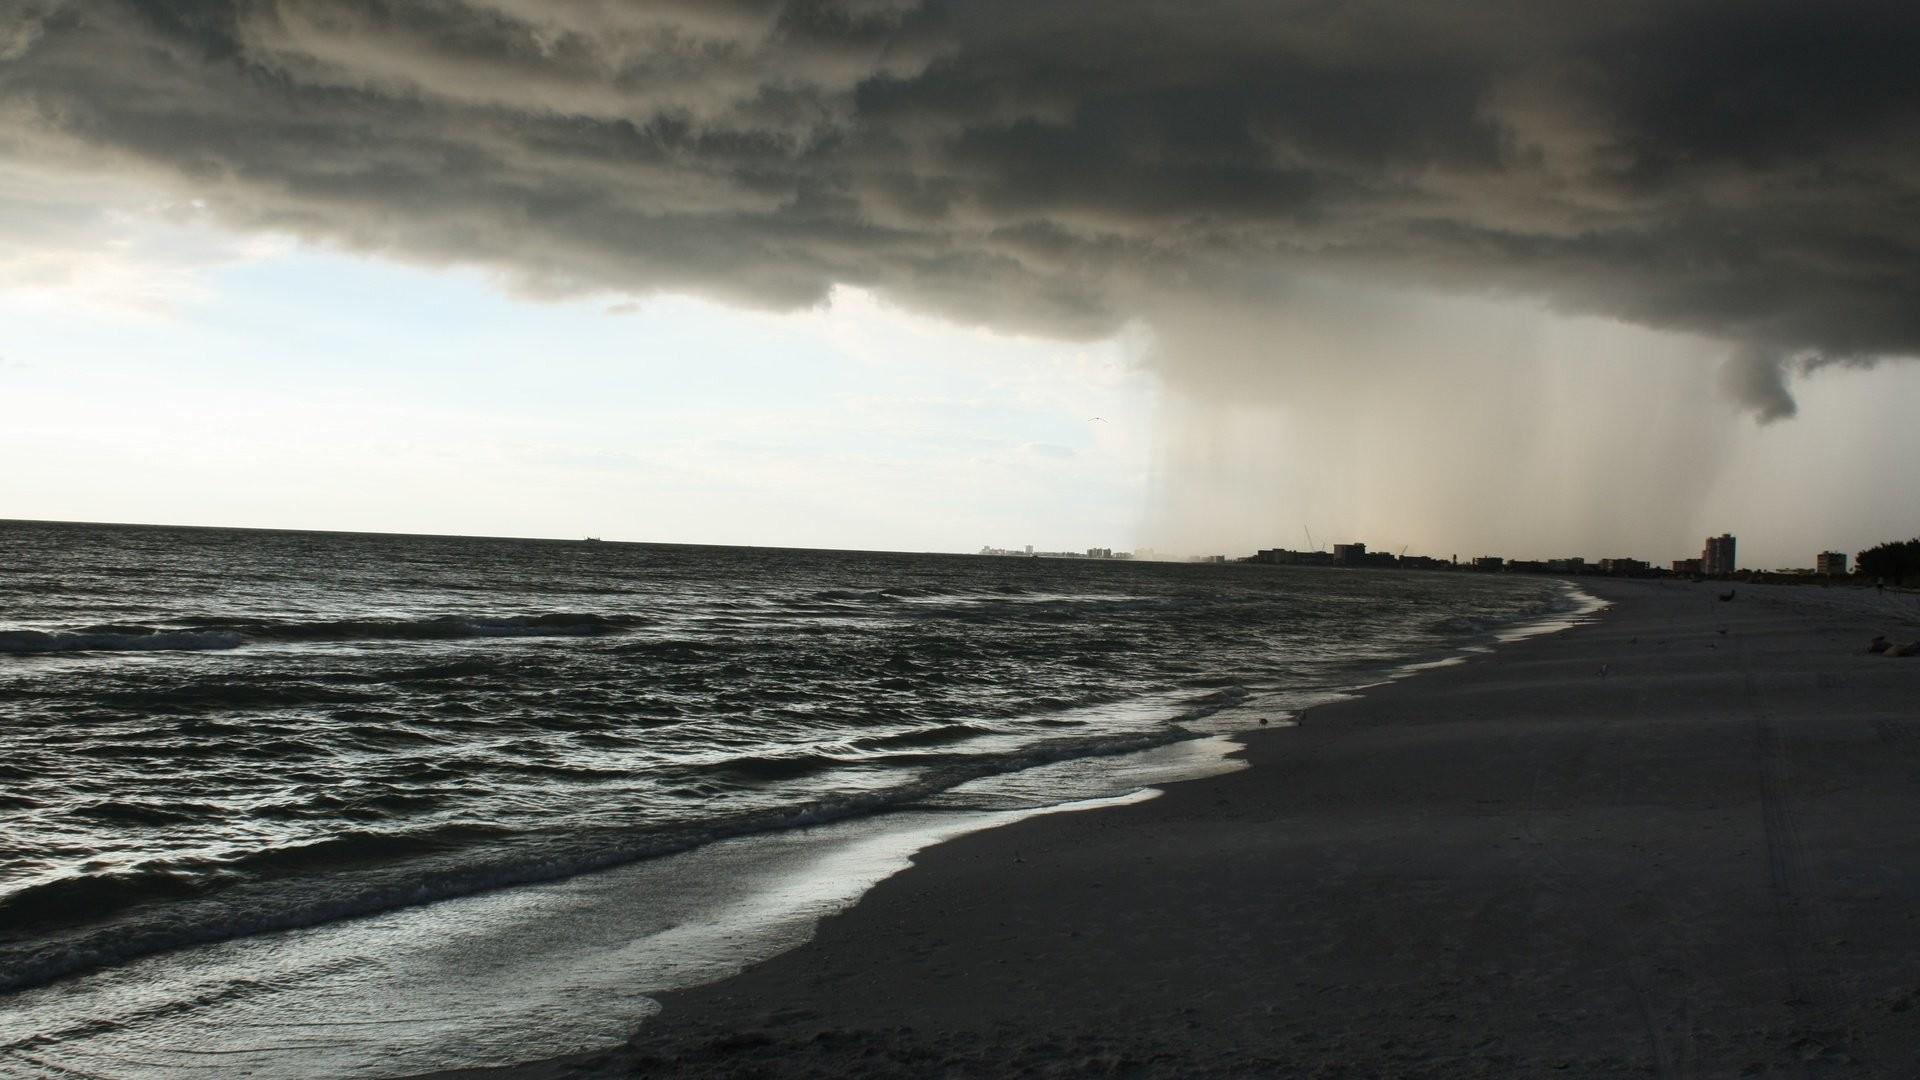 Amazing Thunderstorm